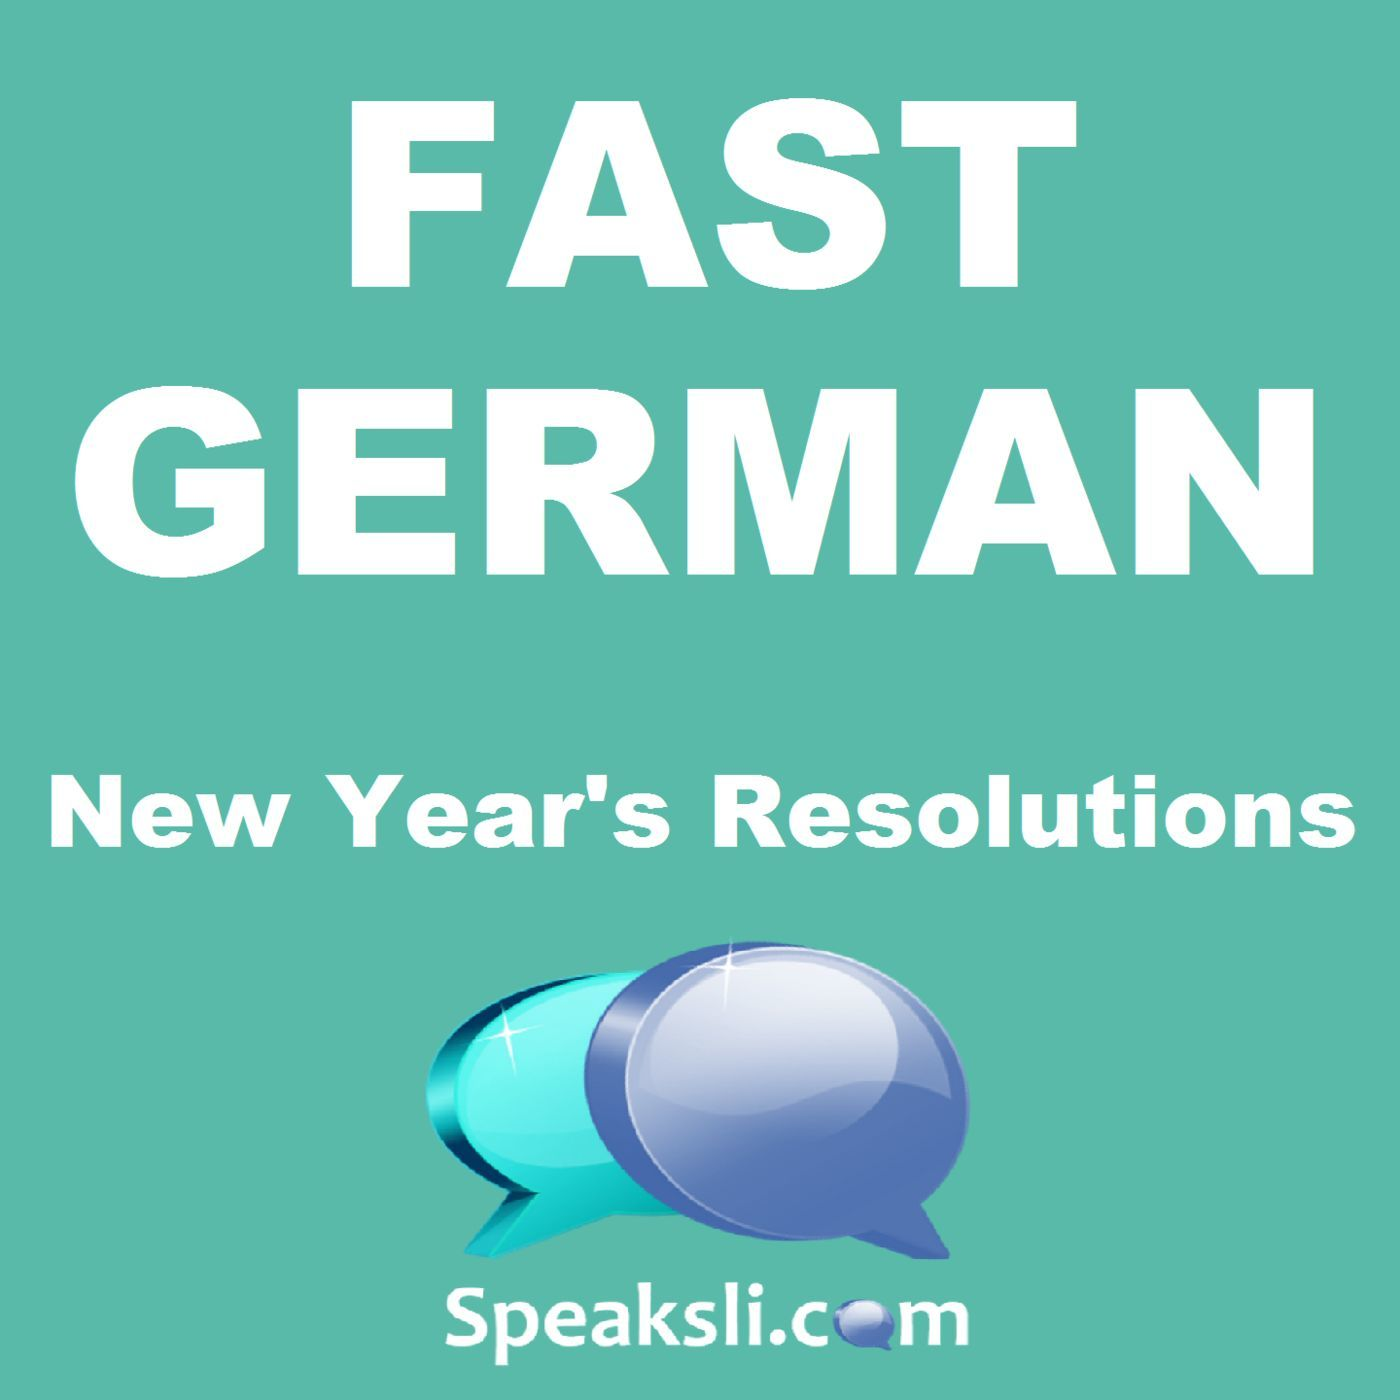 Ep. 35: New Year's Resolutions | Fast German | Speaksli